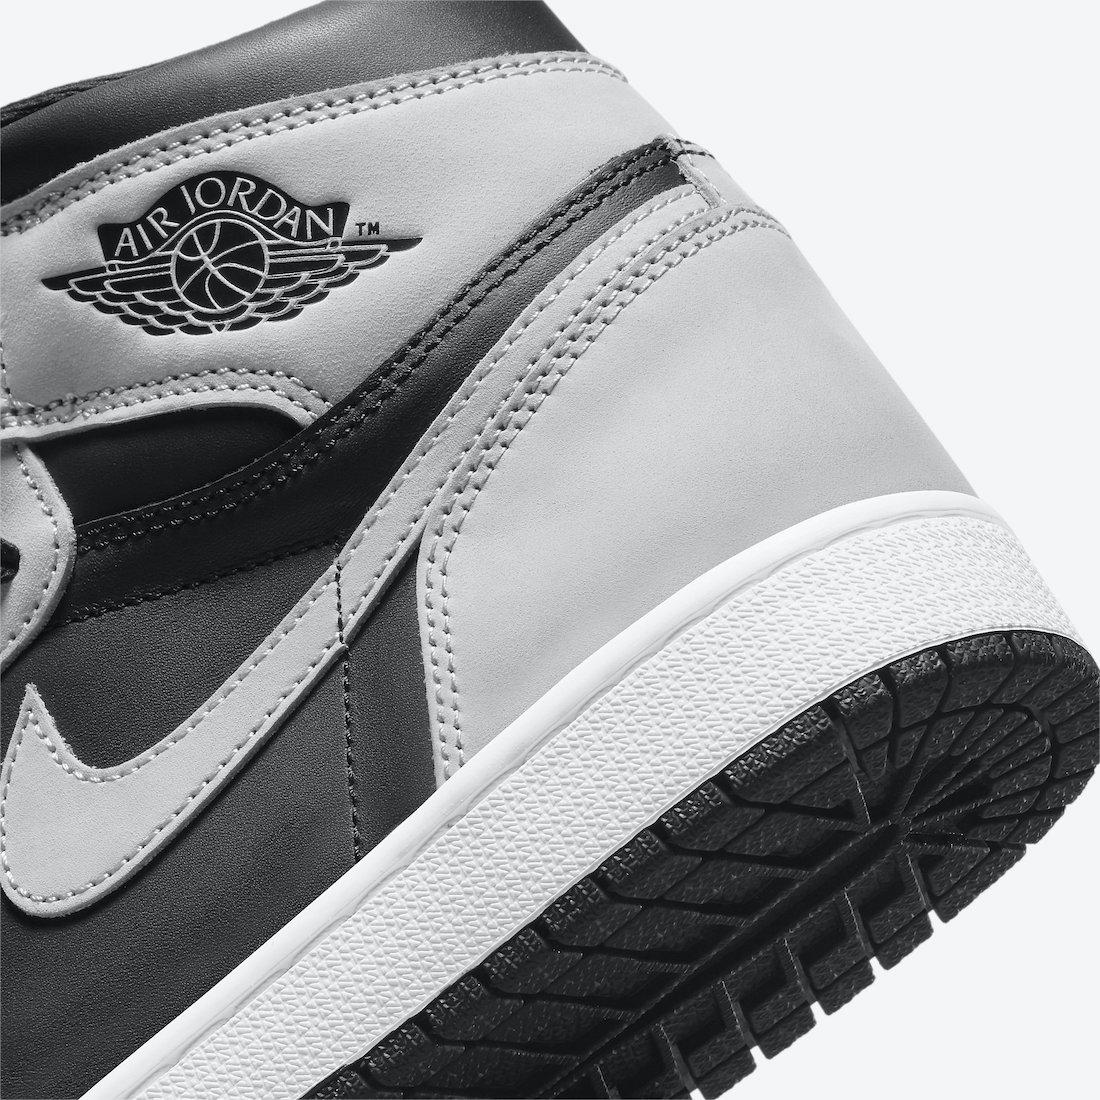 Air-Jordan-1-Shadow-Light-Smoke-Grey-555088-035-Release-Date-Price-7